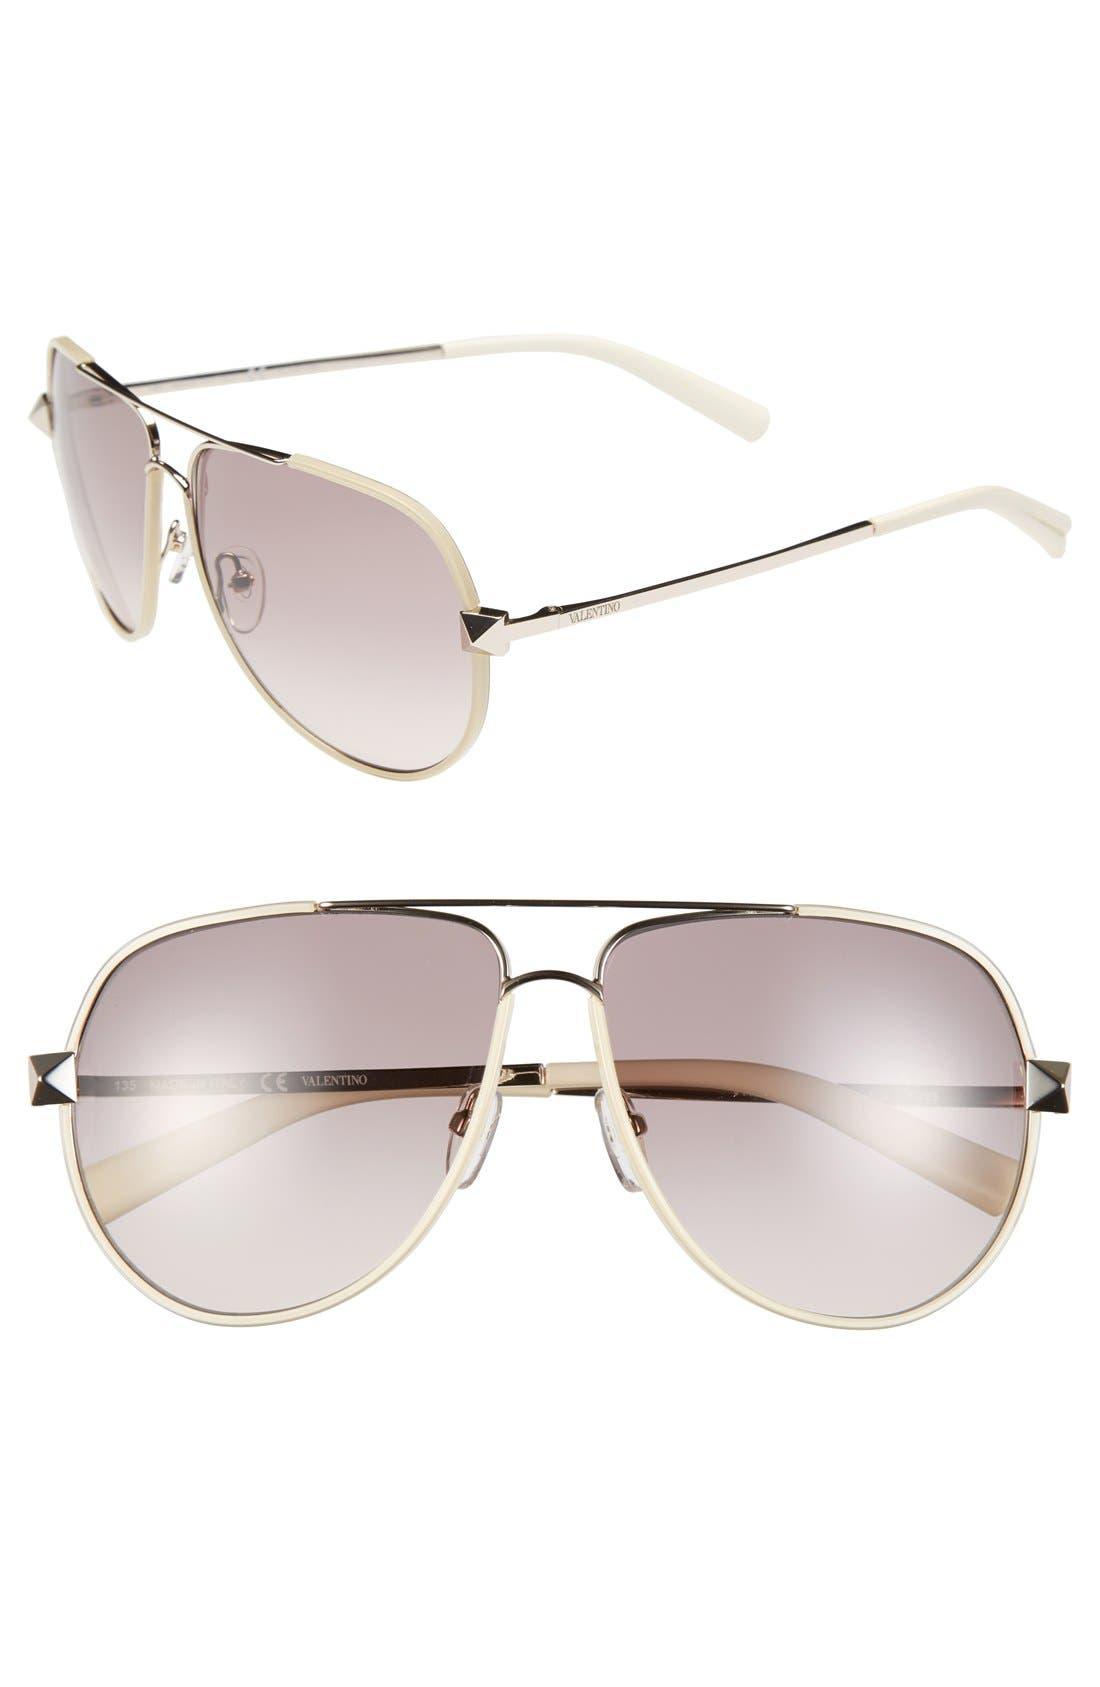 Alternate Image 1 Selected - Valentino 'Rockstud' 60mm Aviator Sunglasses